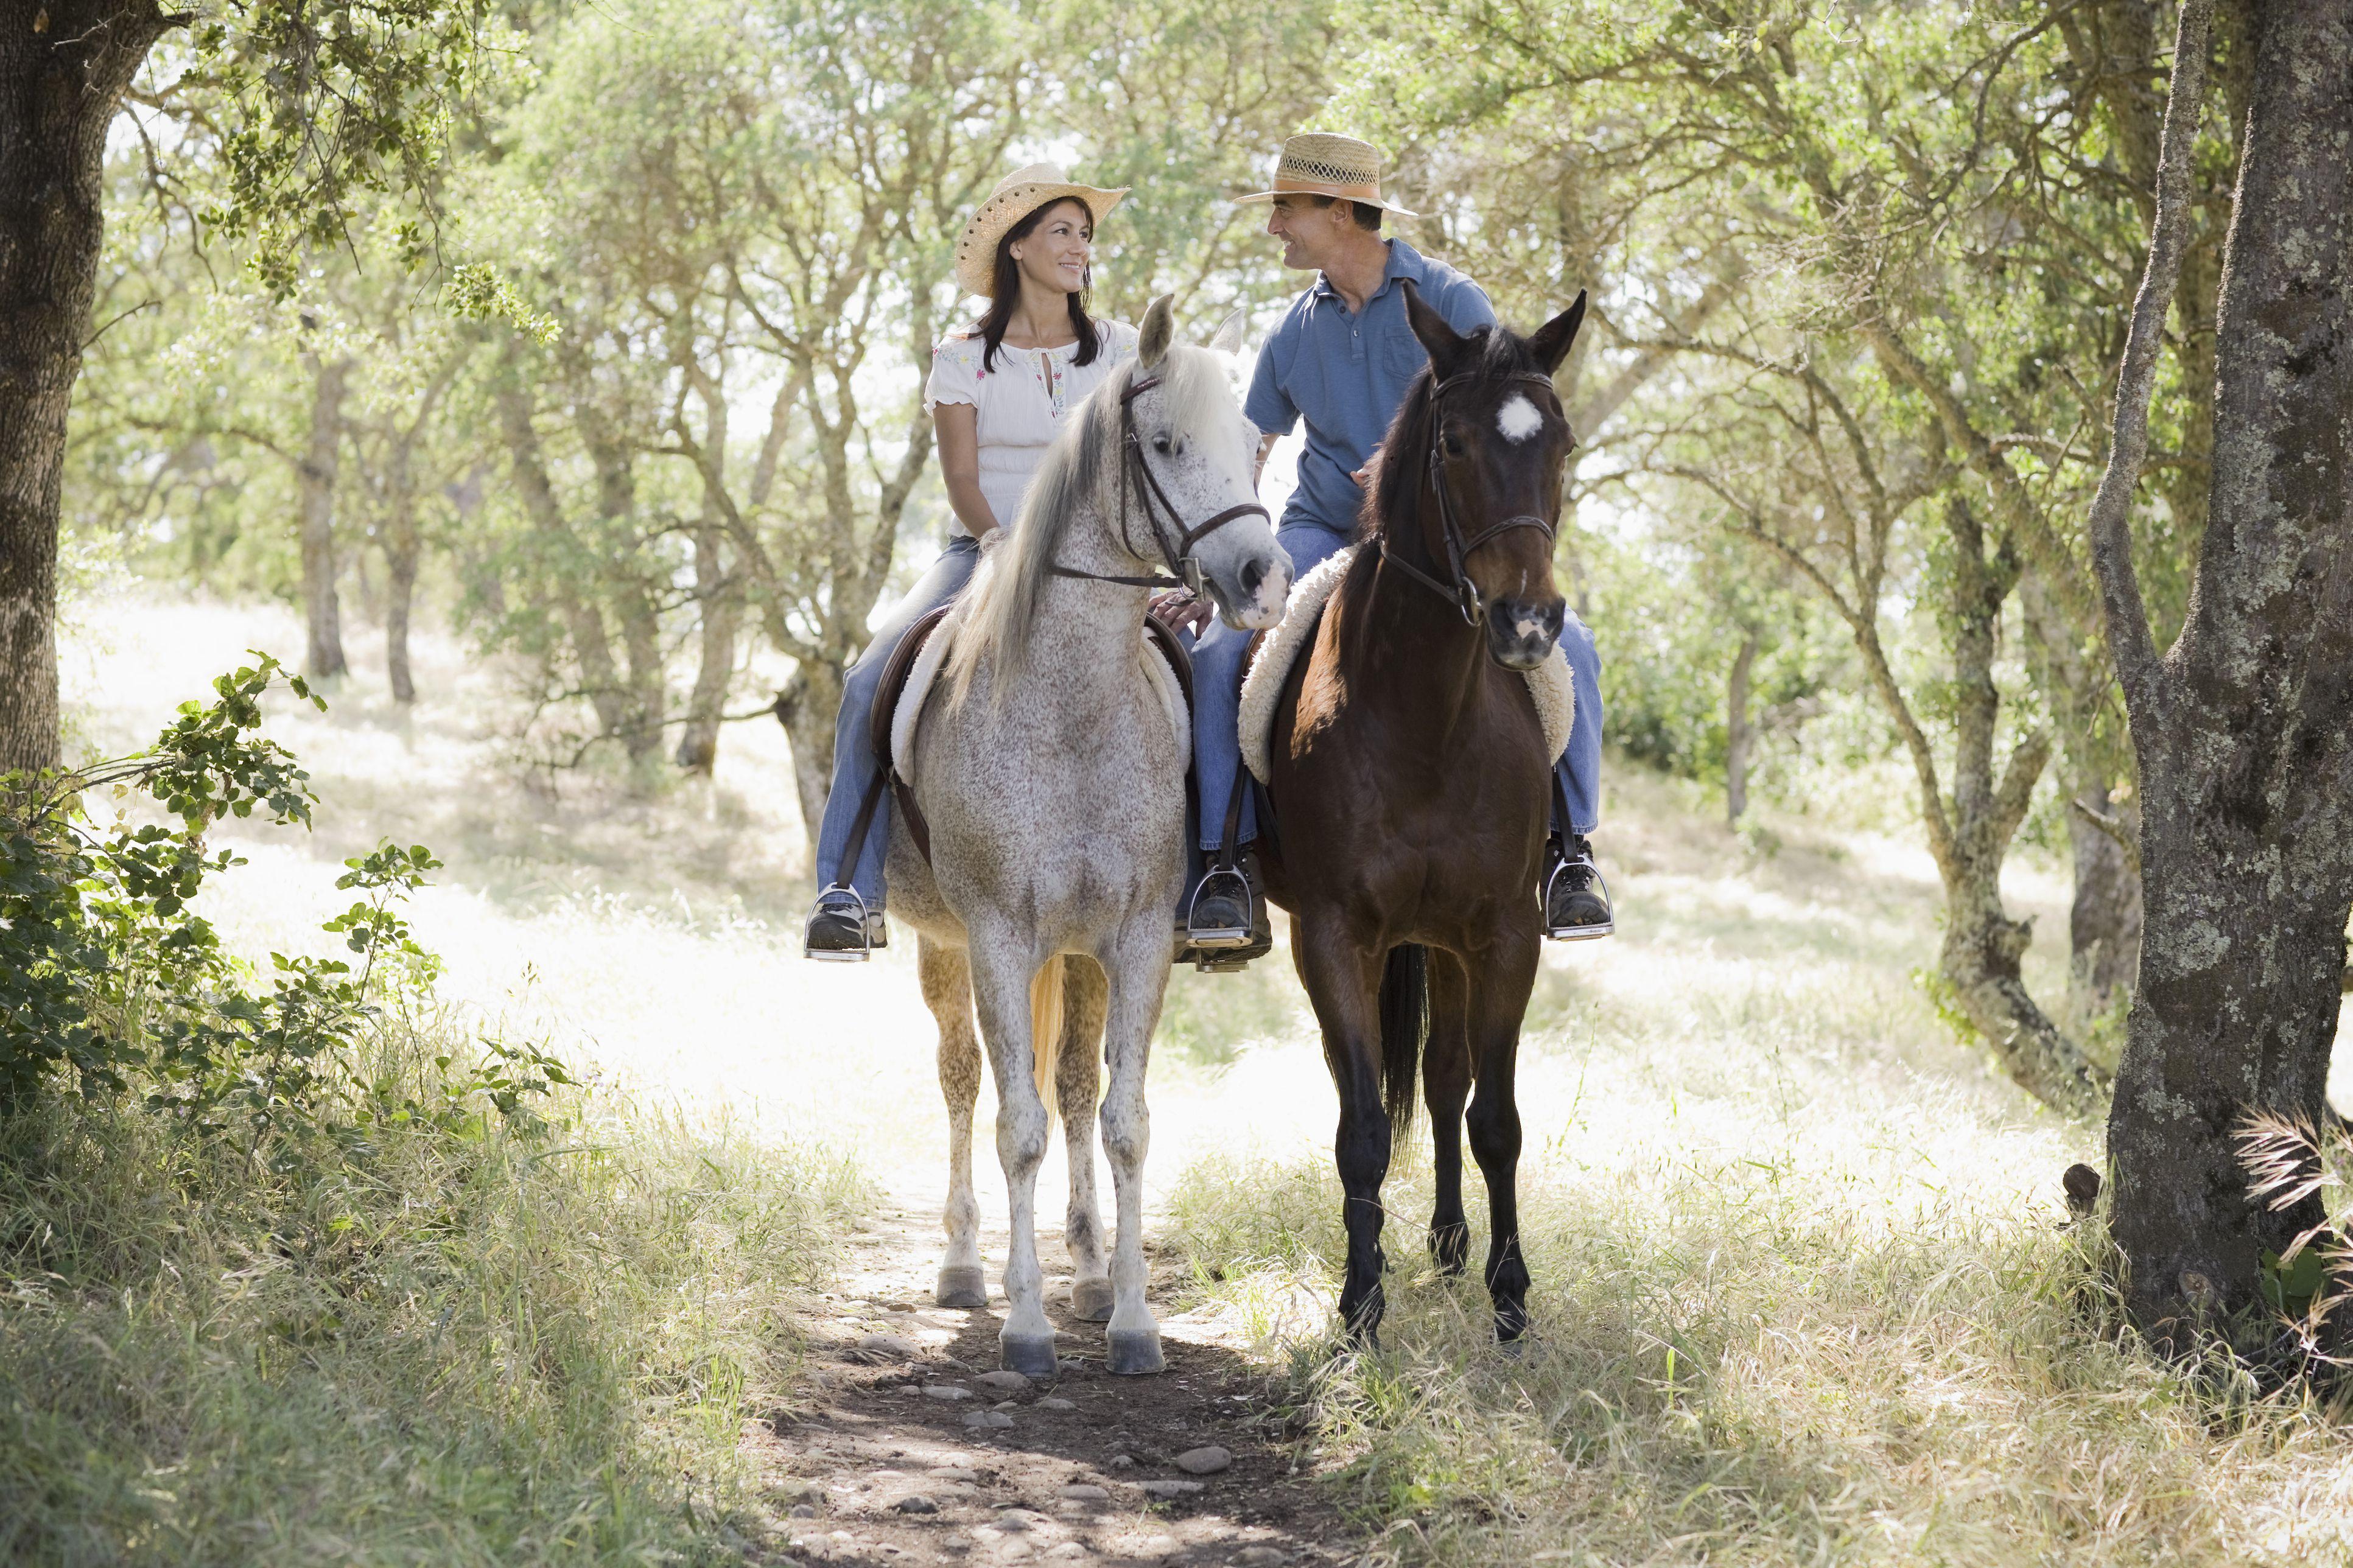 Una pareja montando a caballo